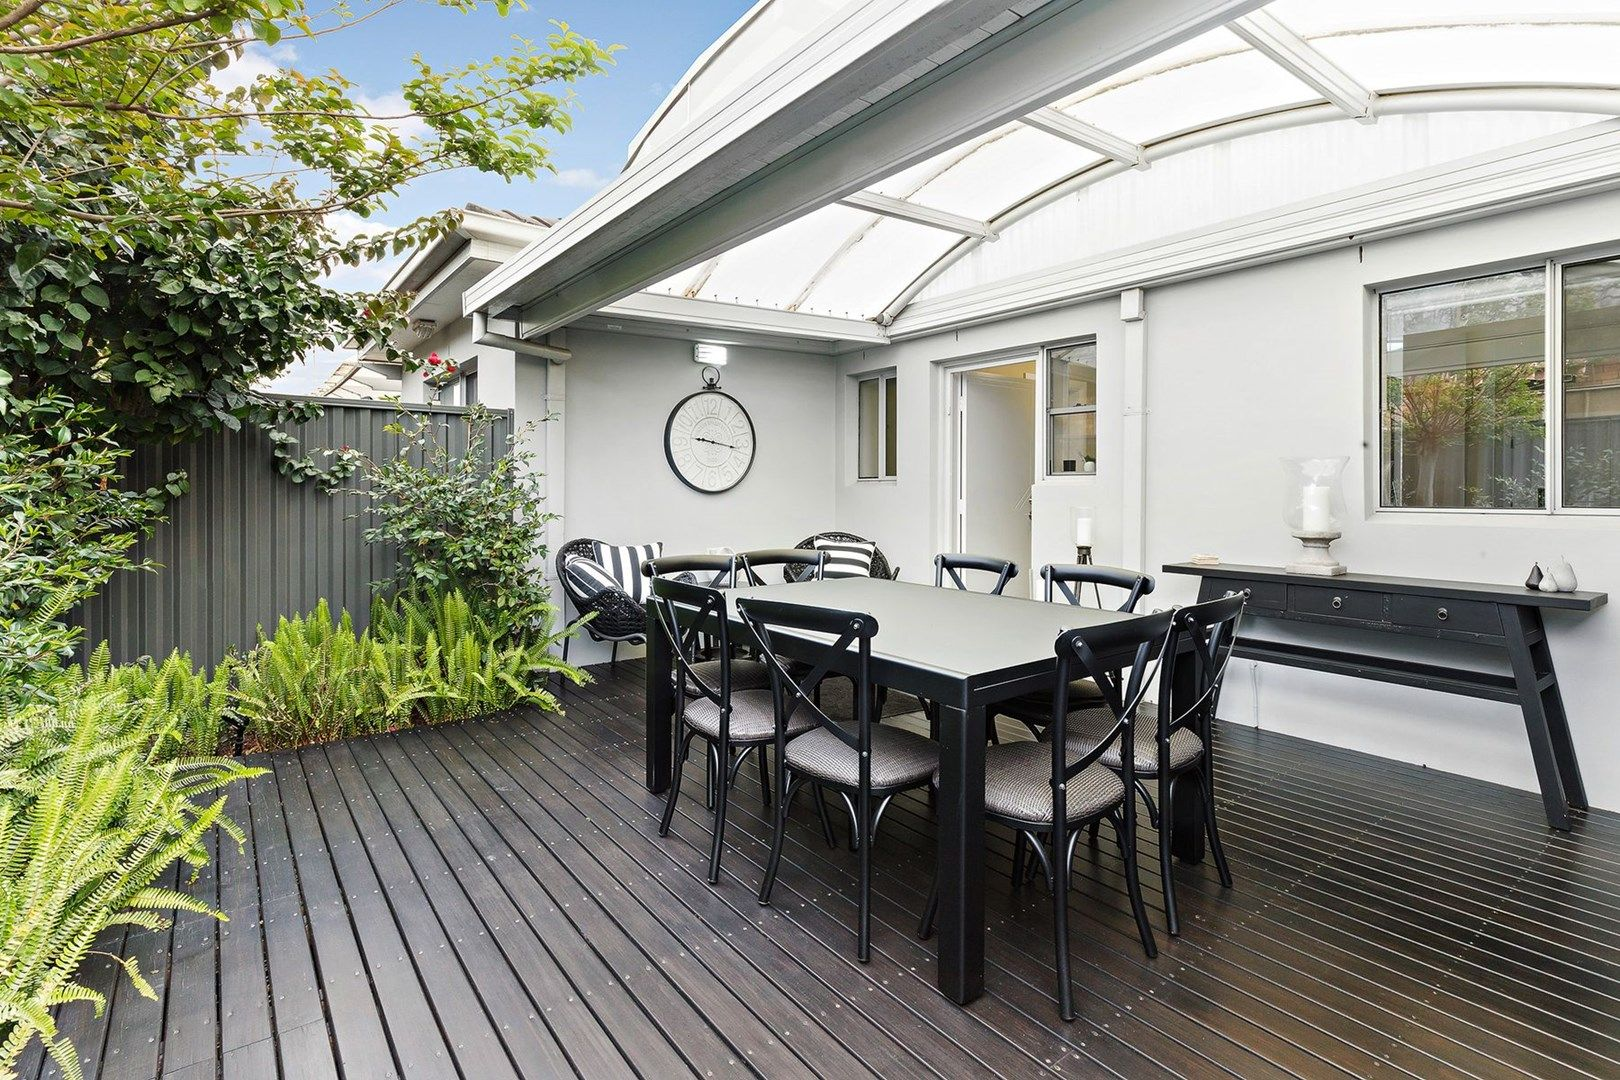 4/35-37 Solander Street, Monterey NSW 2217, Image 0